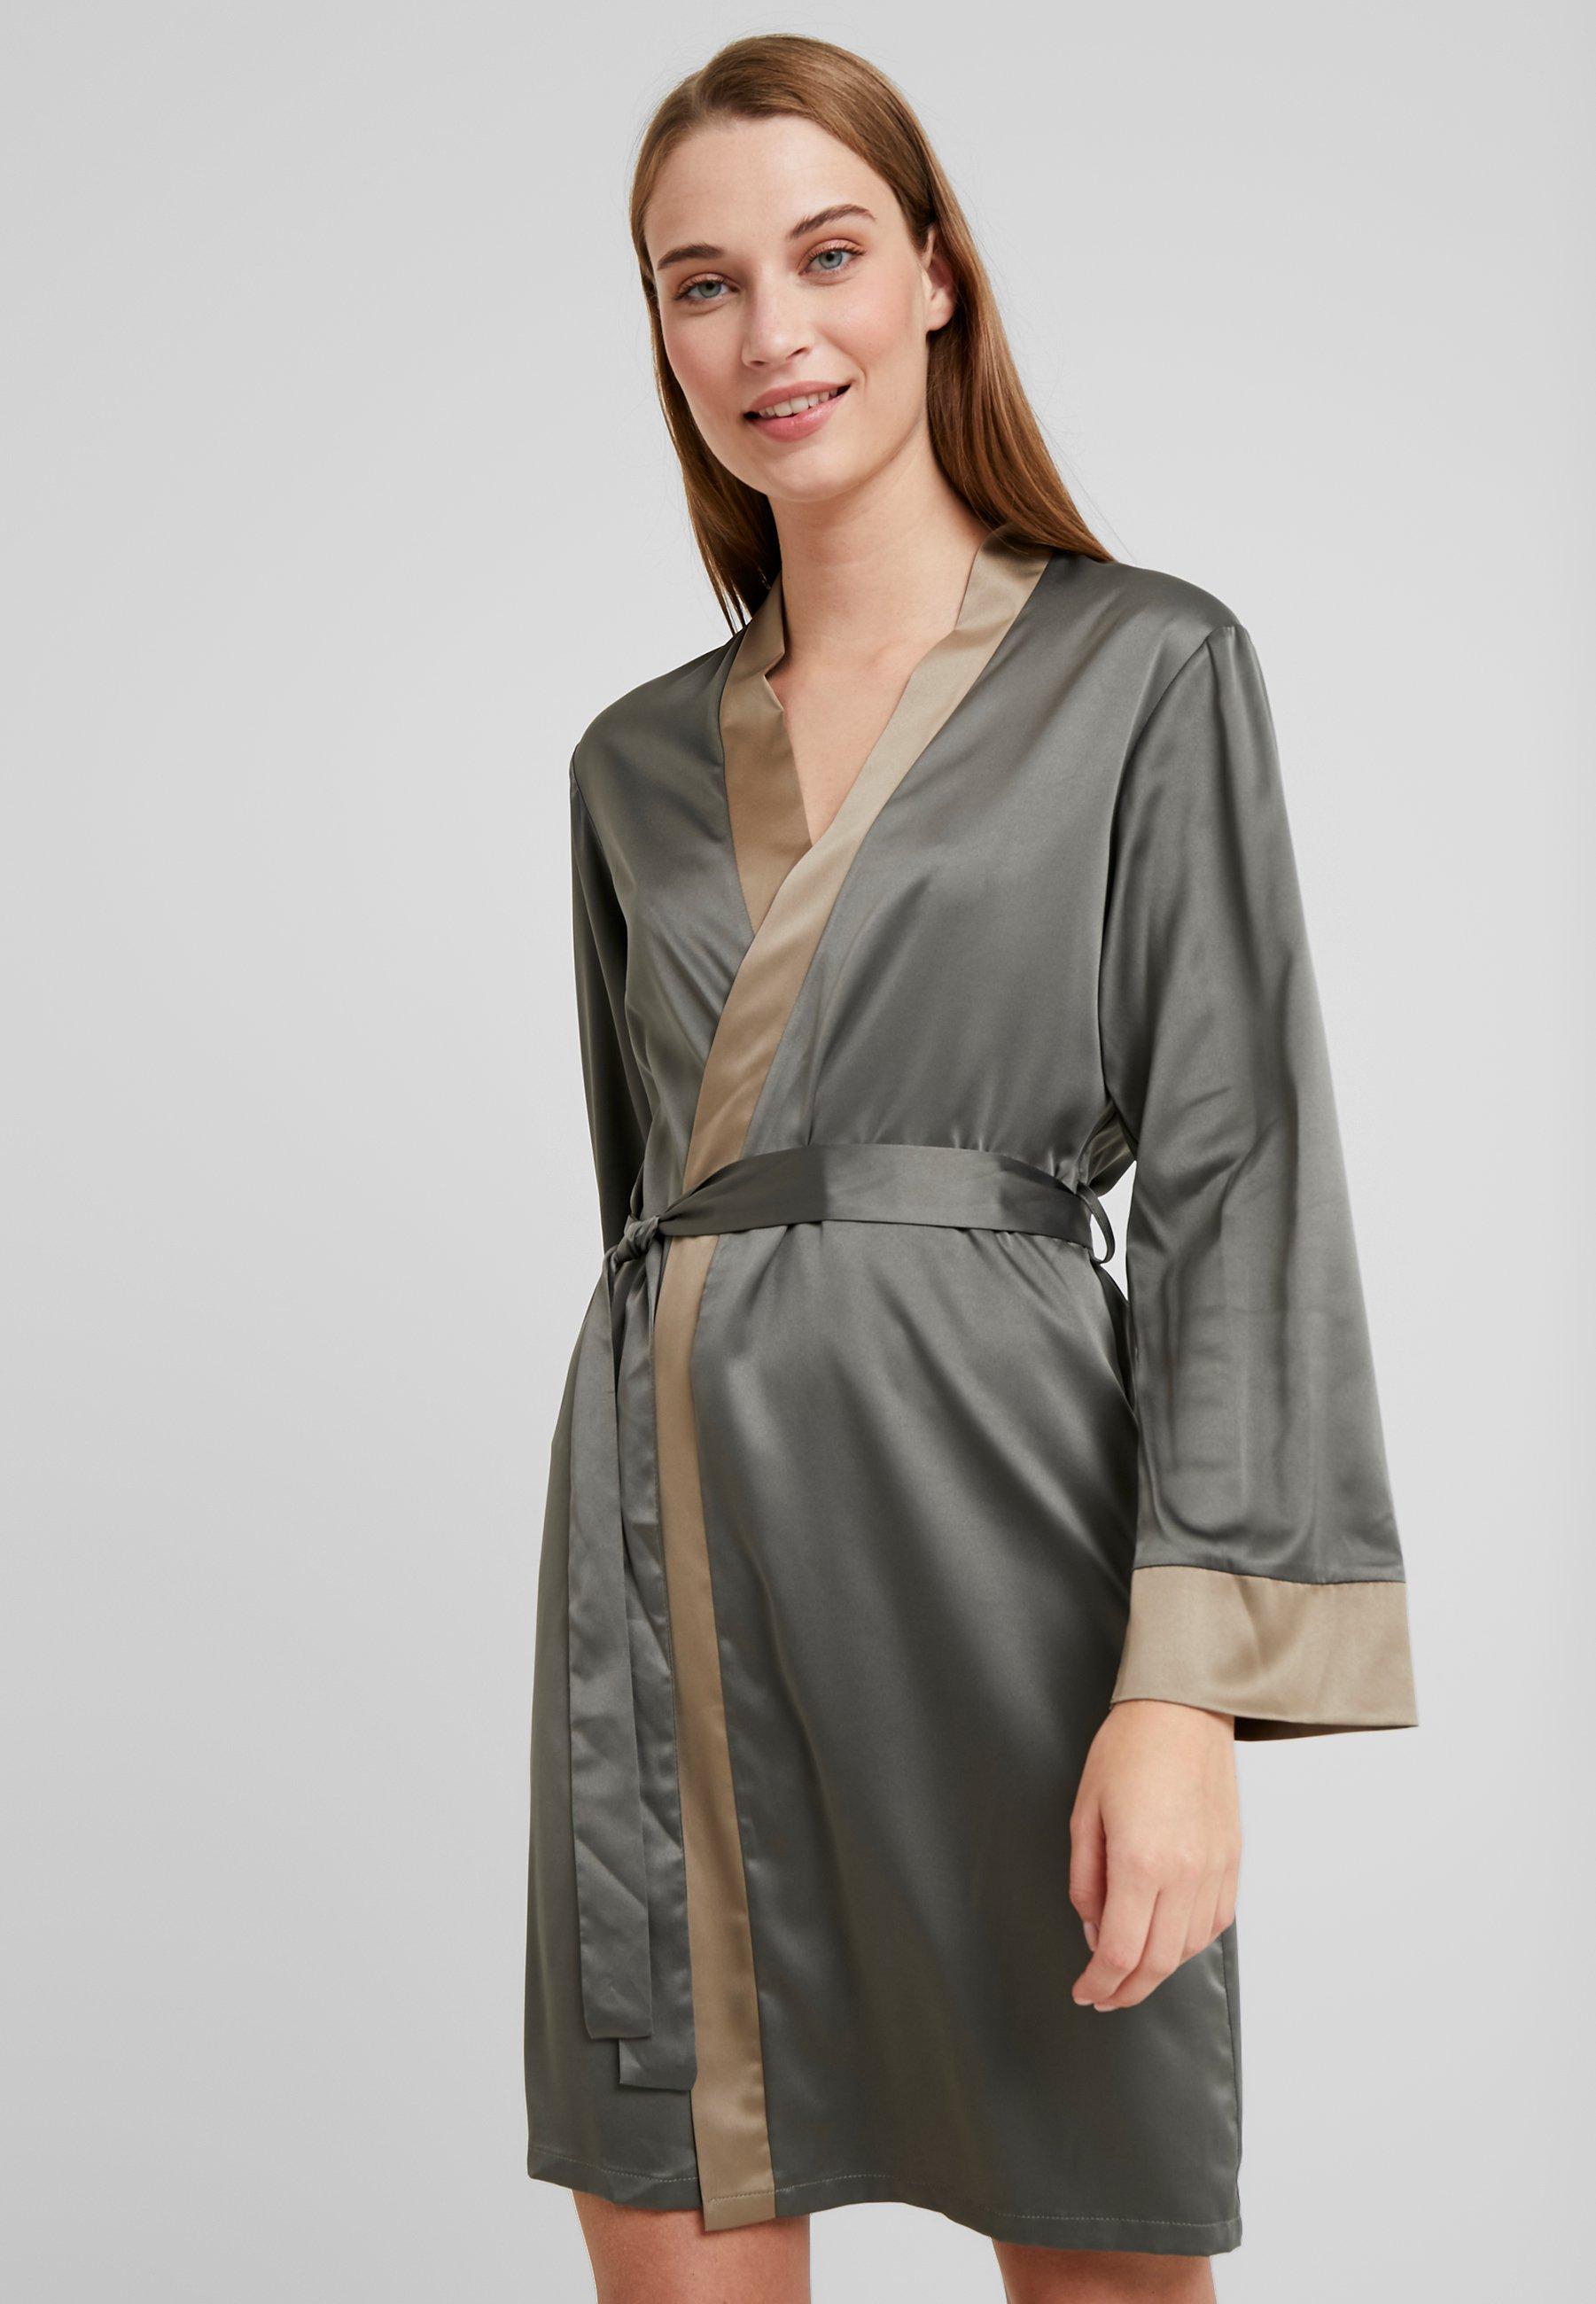 Jungle khaki KimonoAccappatoio Lingadore Dusty Olive wXN0P8kOn